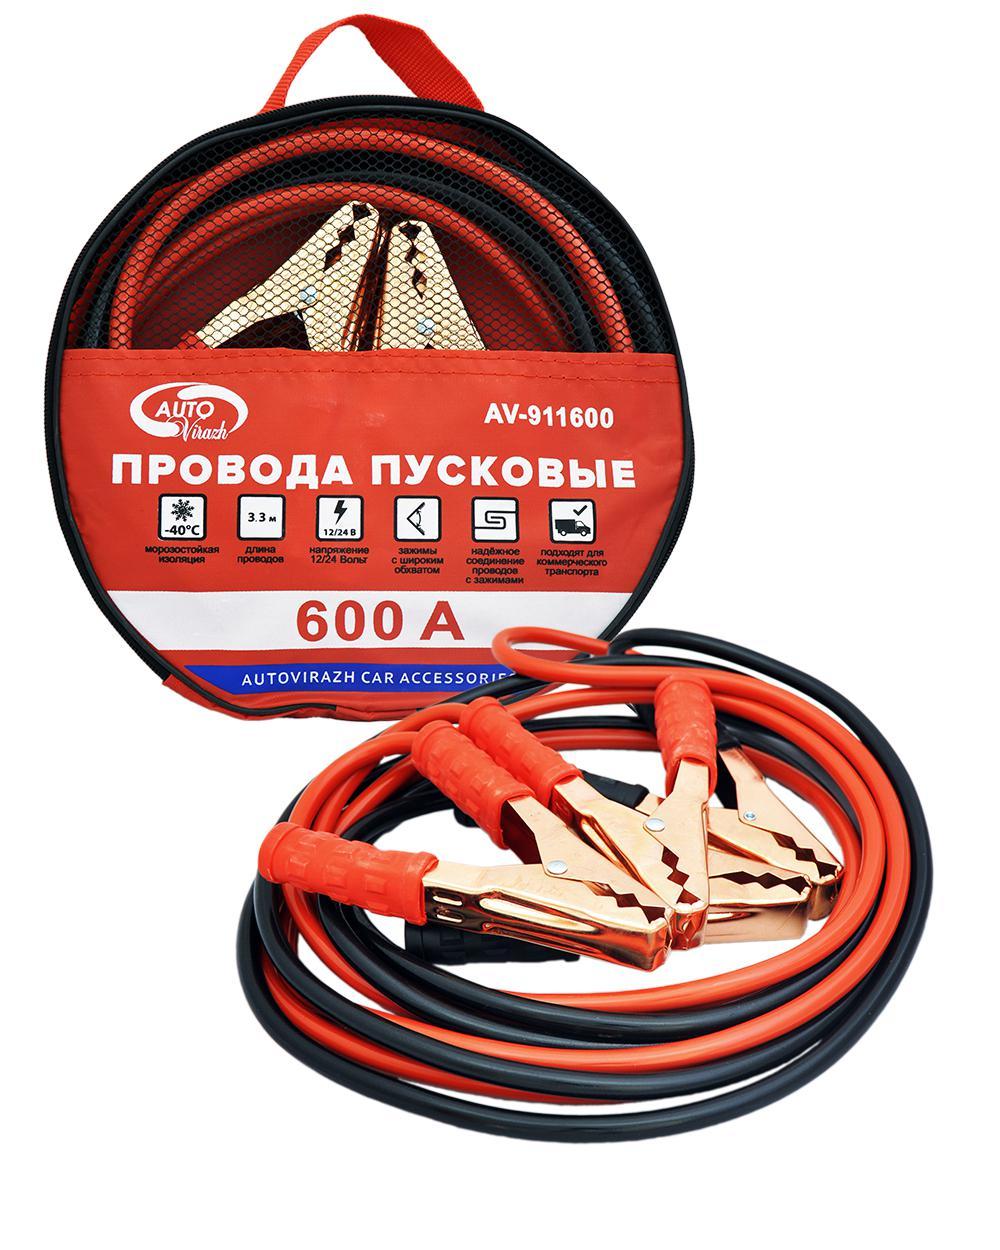 Провода стартовые Autovirazh Av-911600 цена